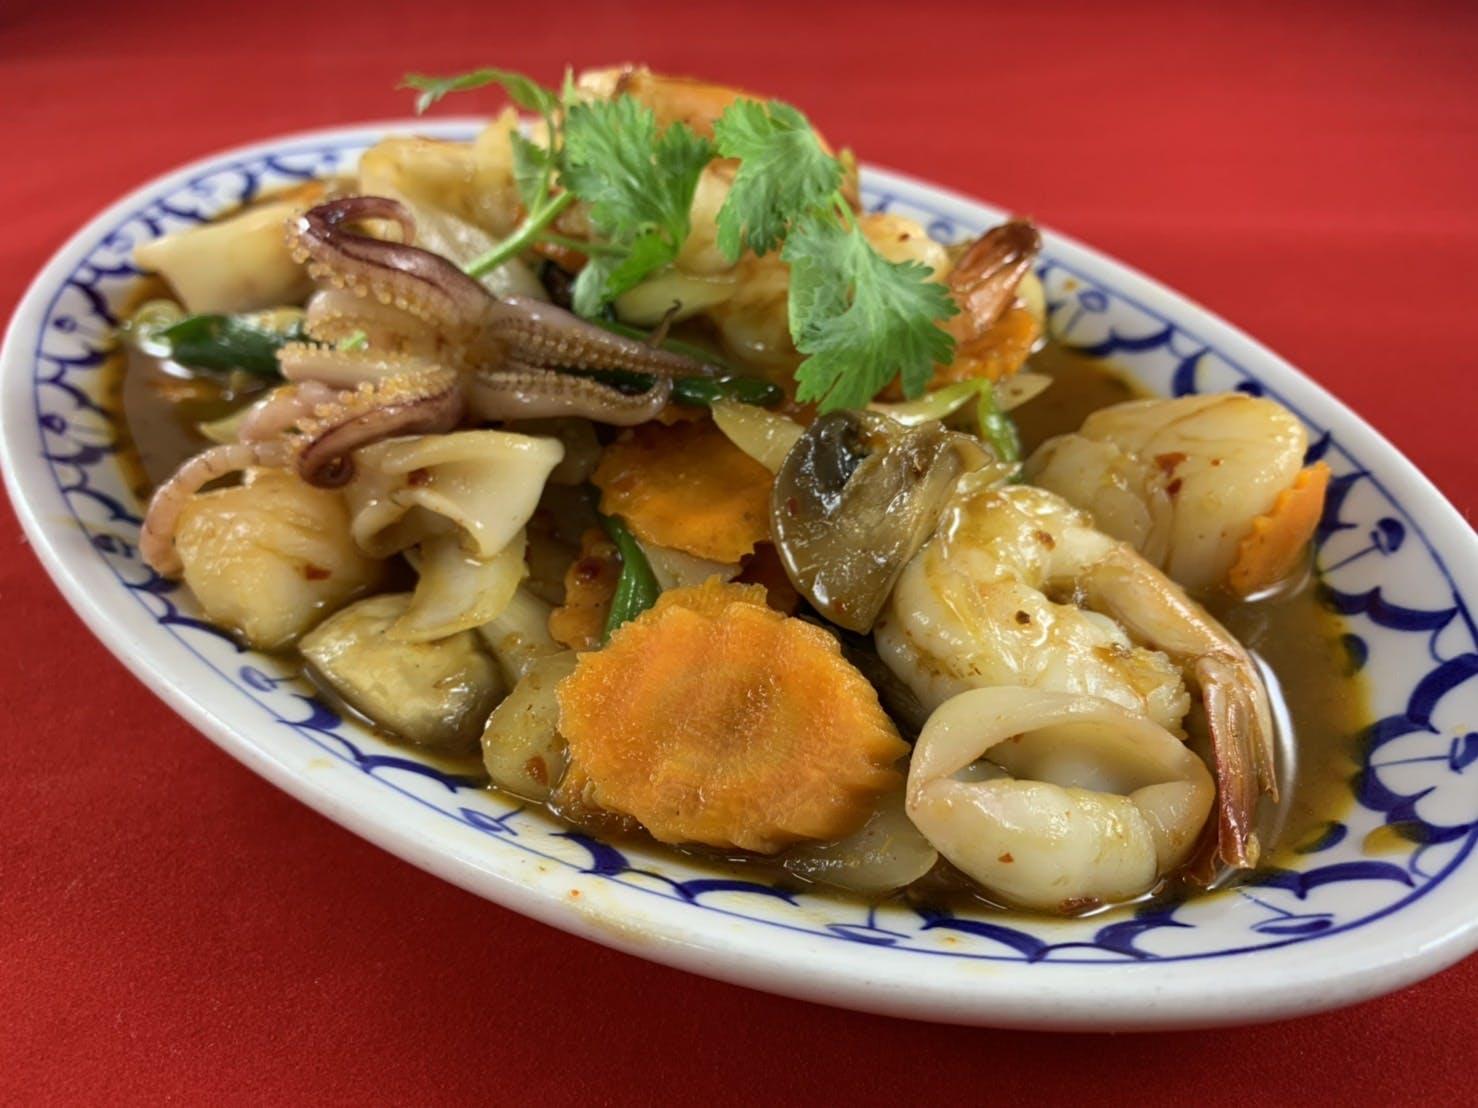 62. Tom Yum Talay Hang (Dinner) from Sa-Bai Thong - University Ave in Madison, WI